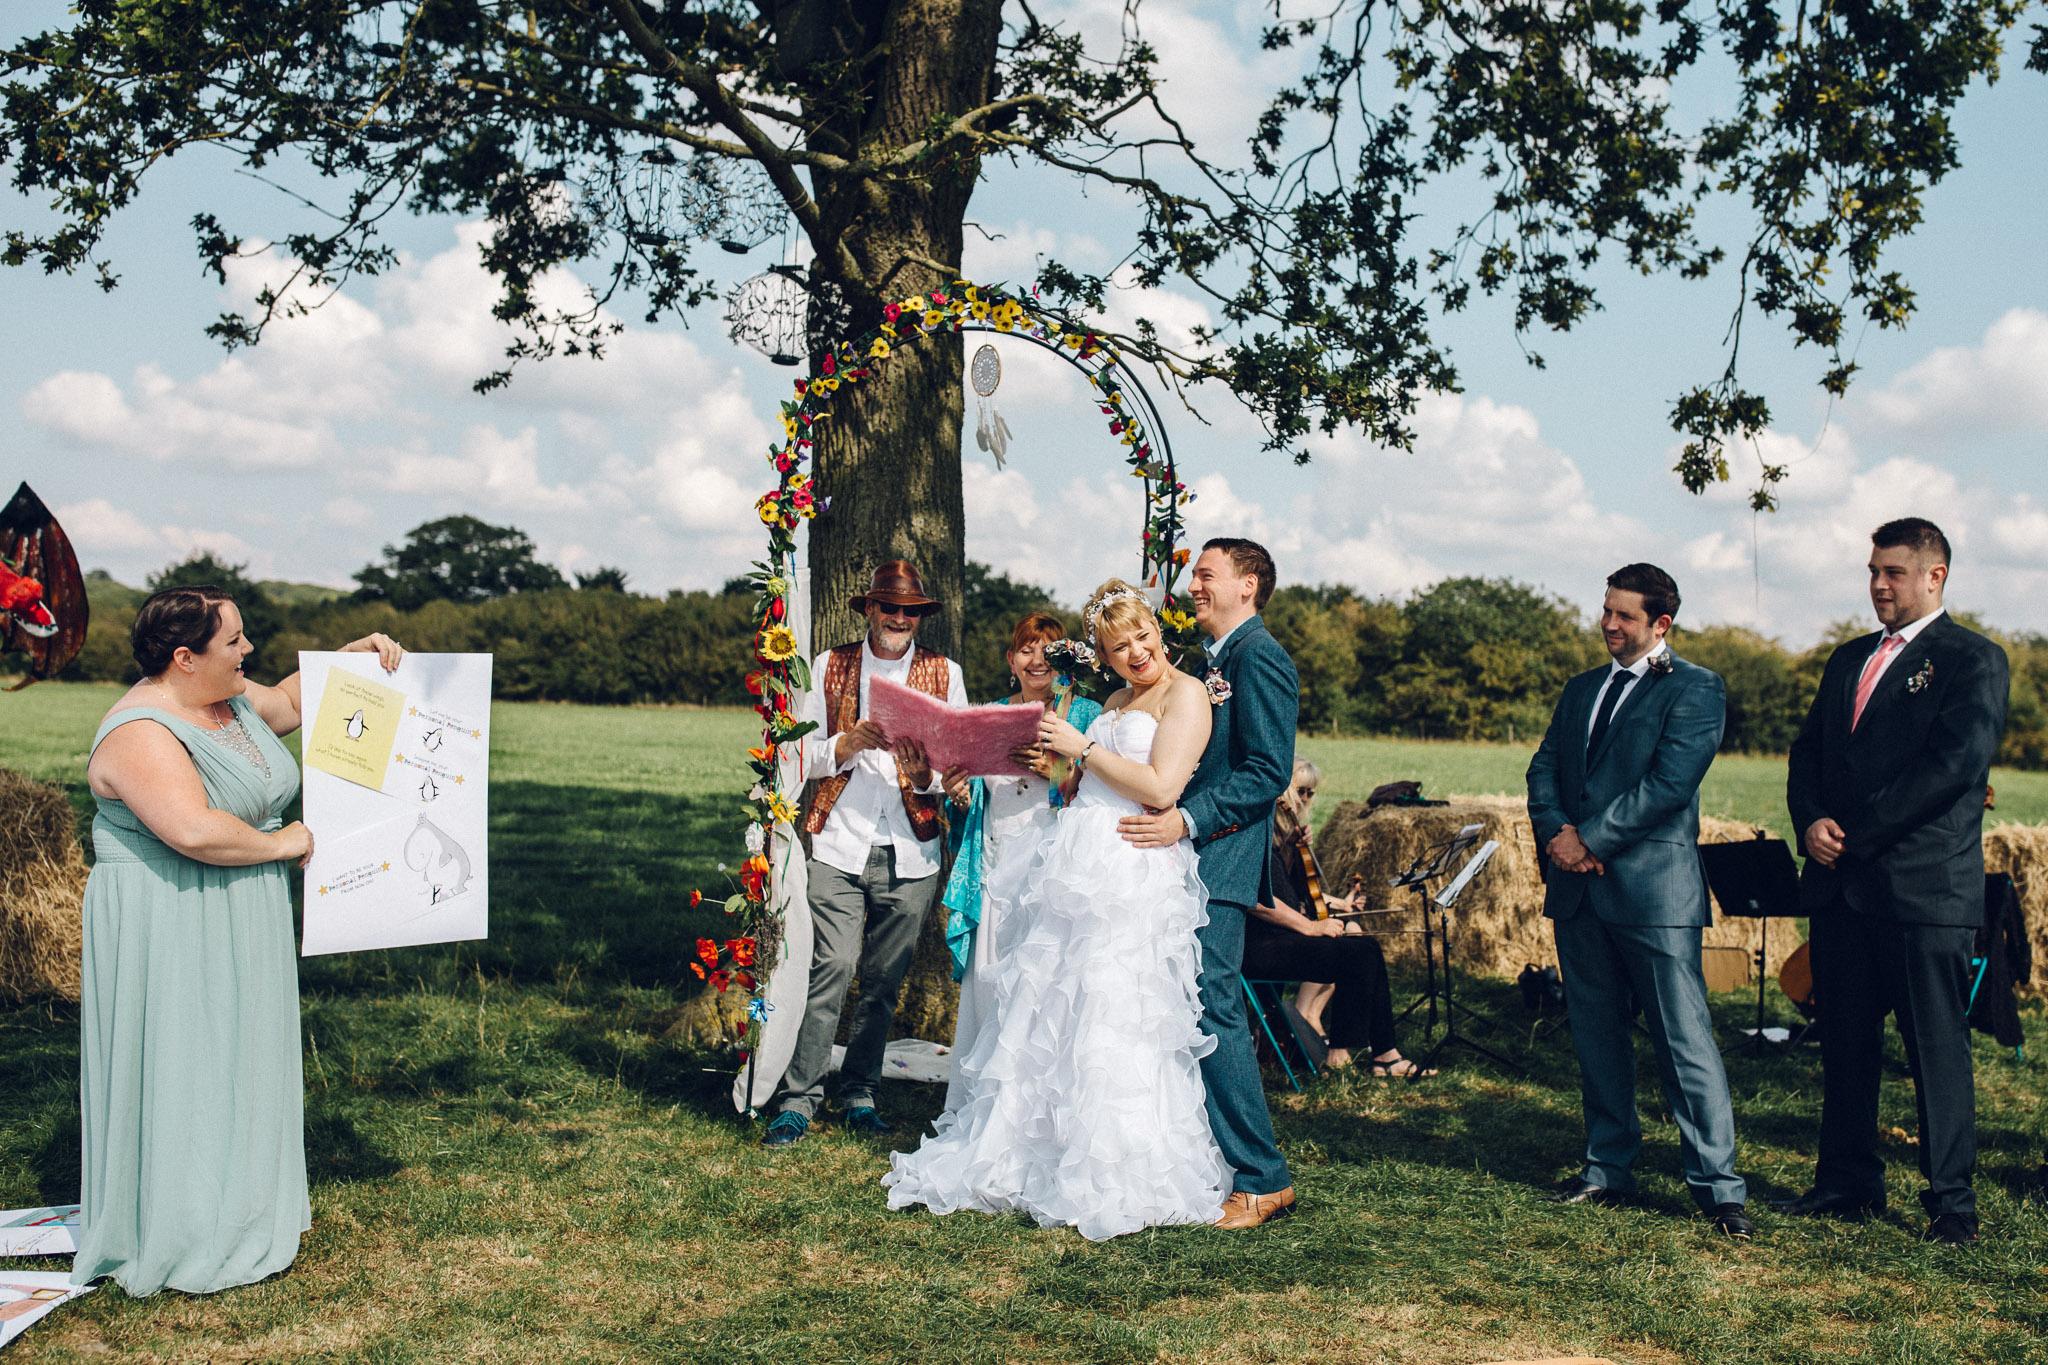 Fun colourful wedding Alternative Wedding Photography - I Do The Country Wed, Quainton